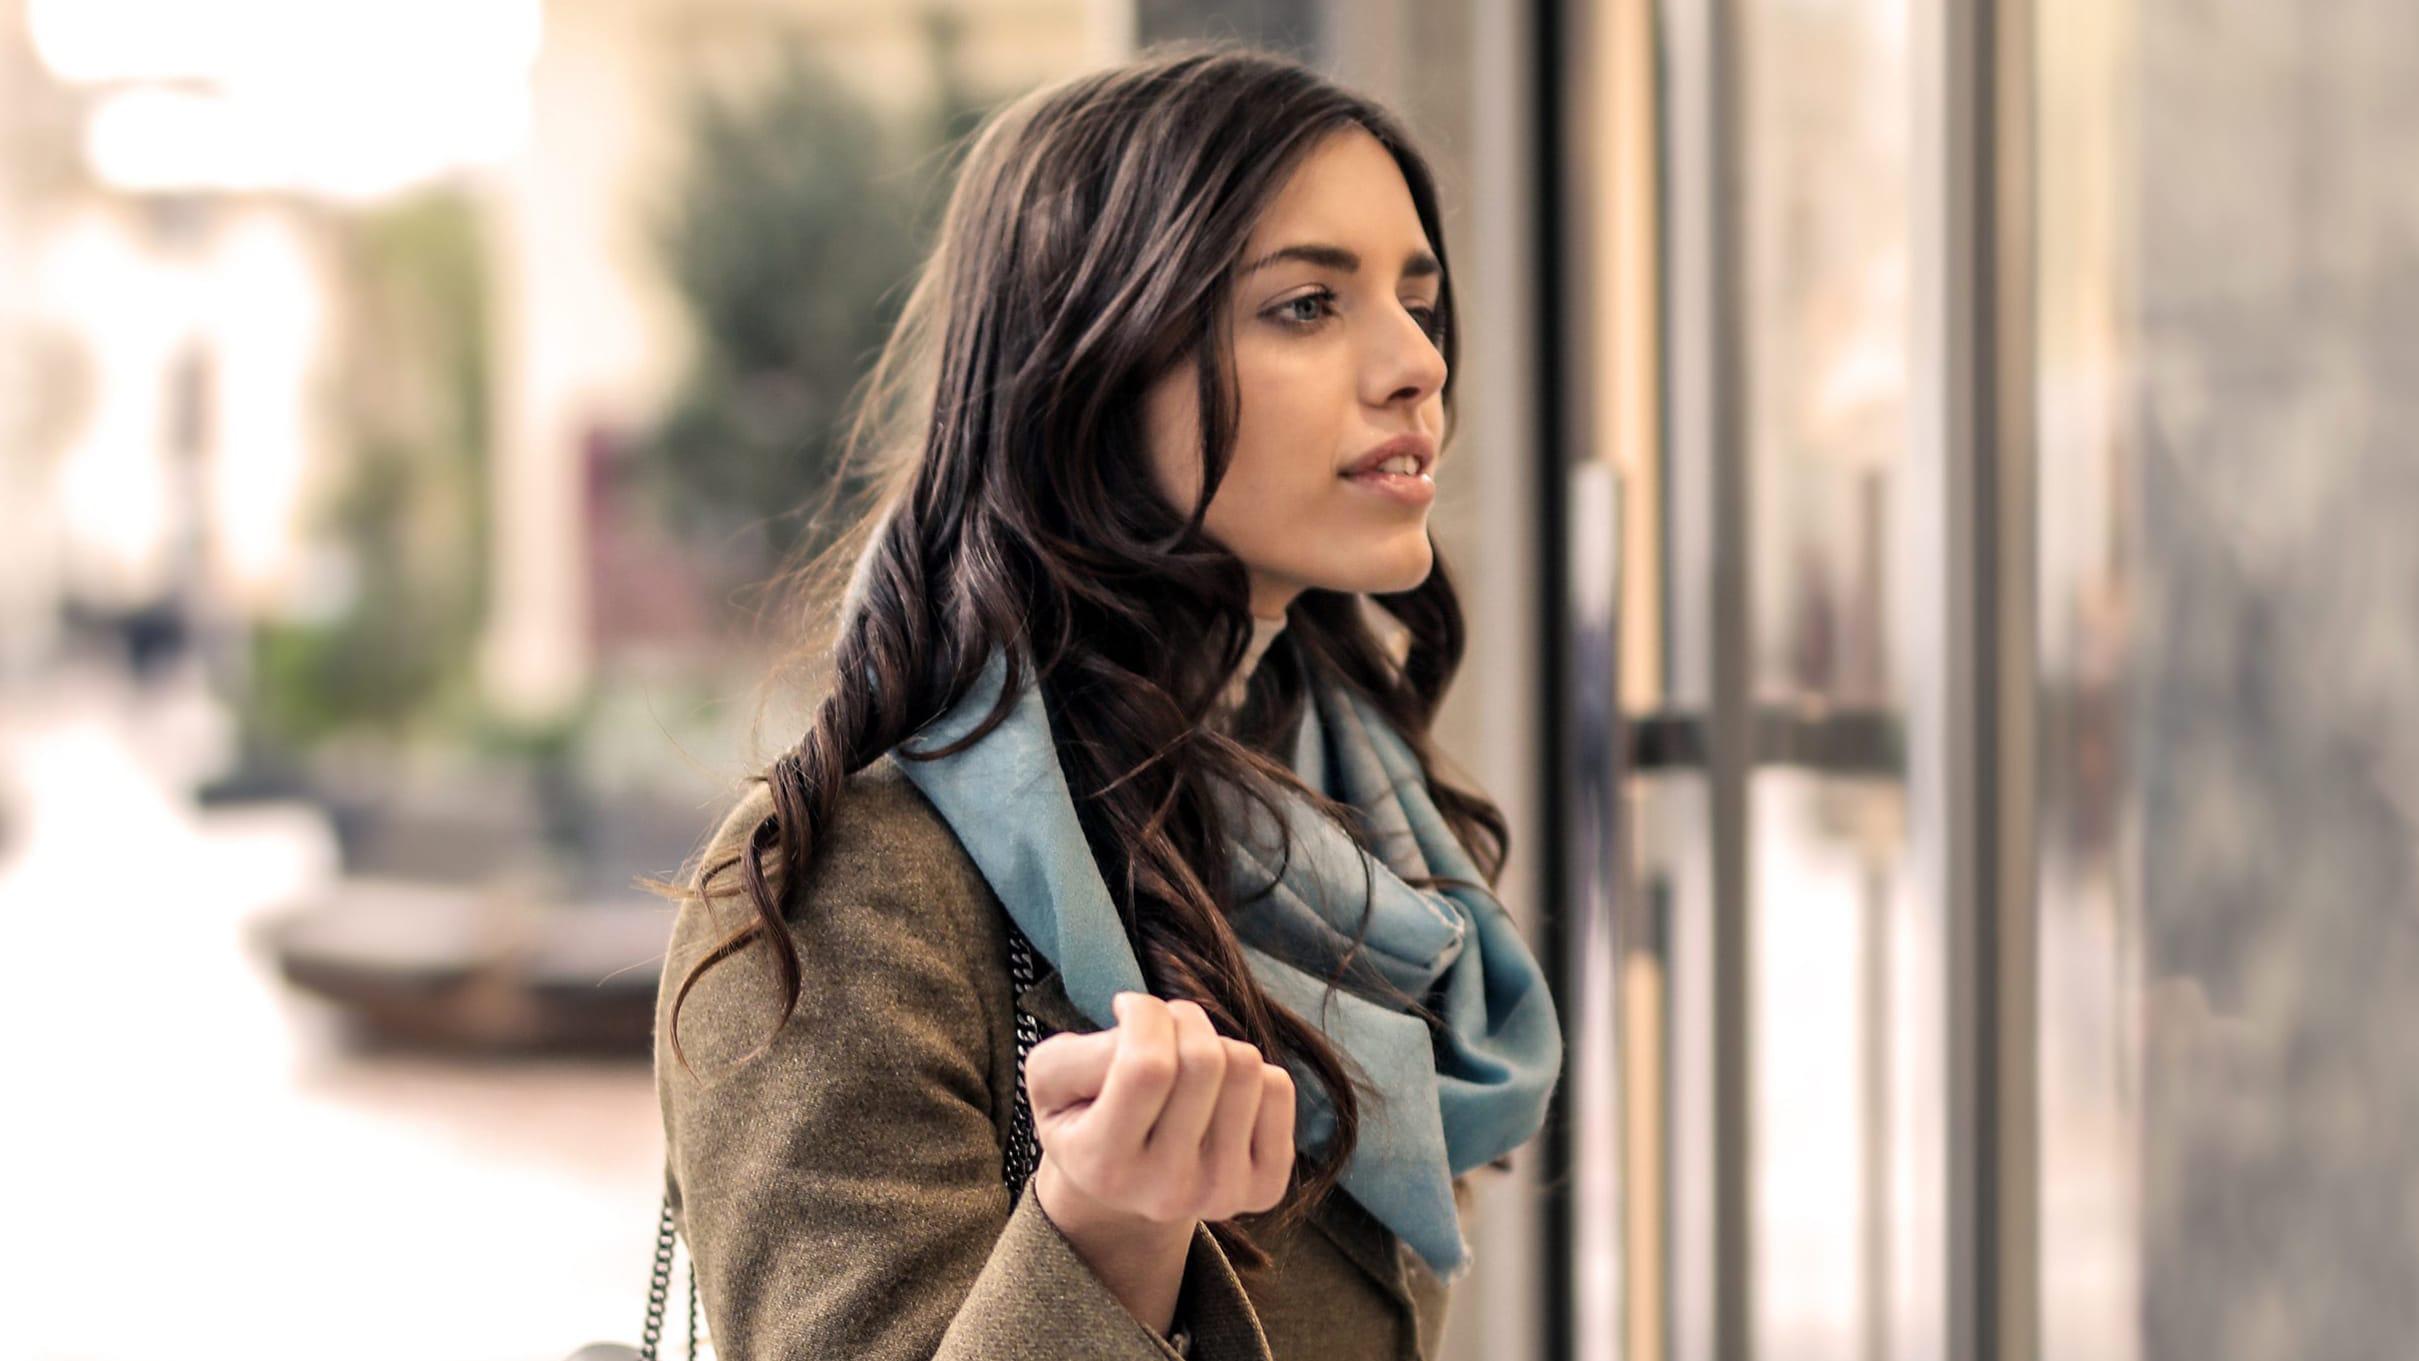 MOBILVERSION-Kvindelig brunette ser gennem et butiksvindue da hun har hørt musik fra forretningen